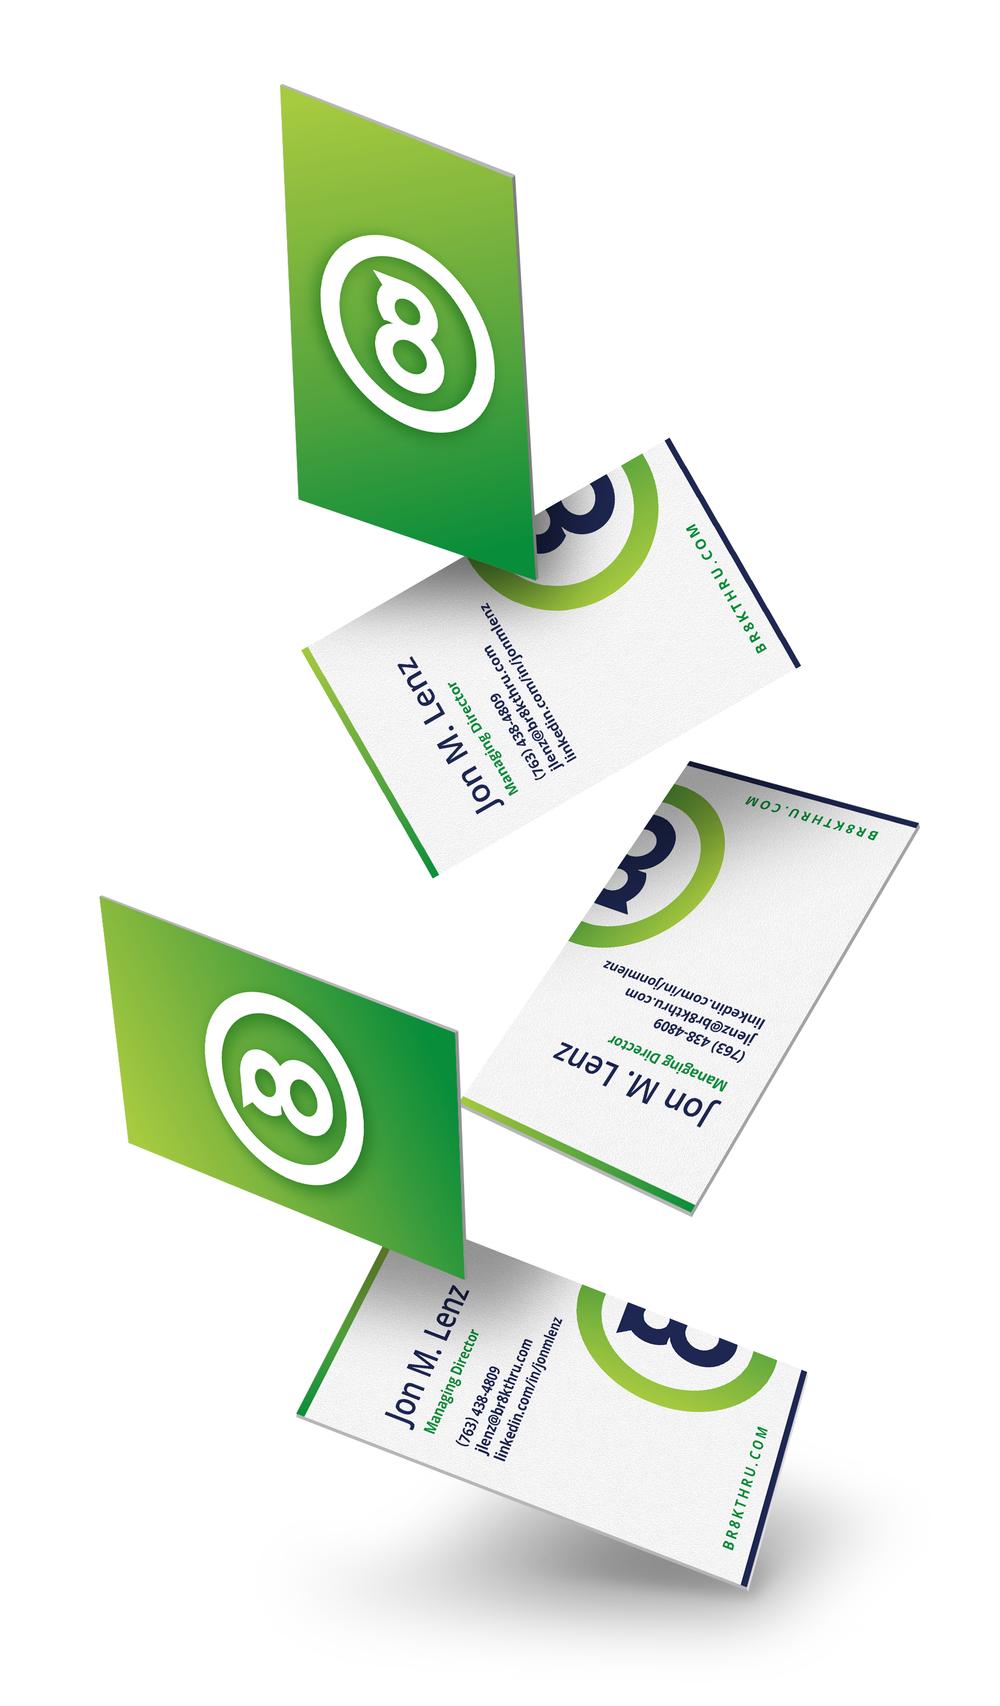 falling-business-card-mockups_5.png